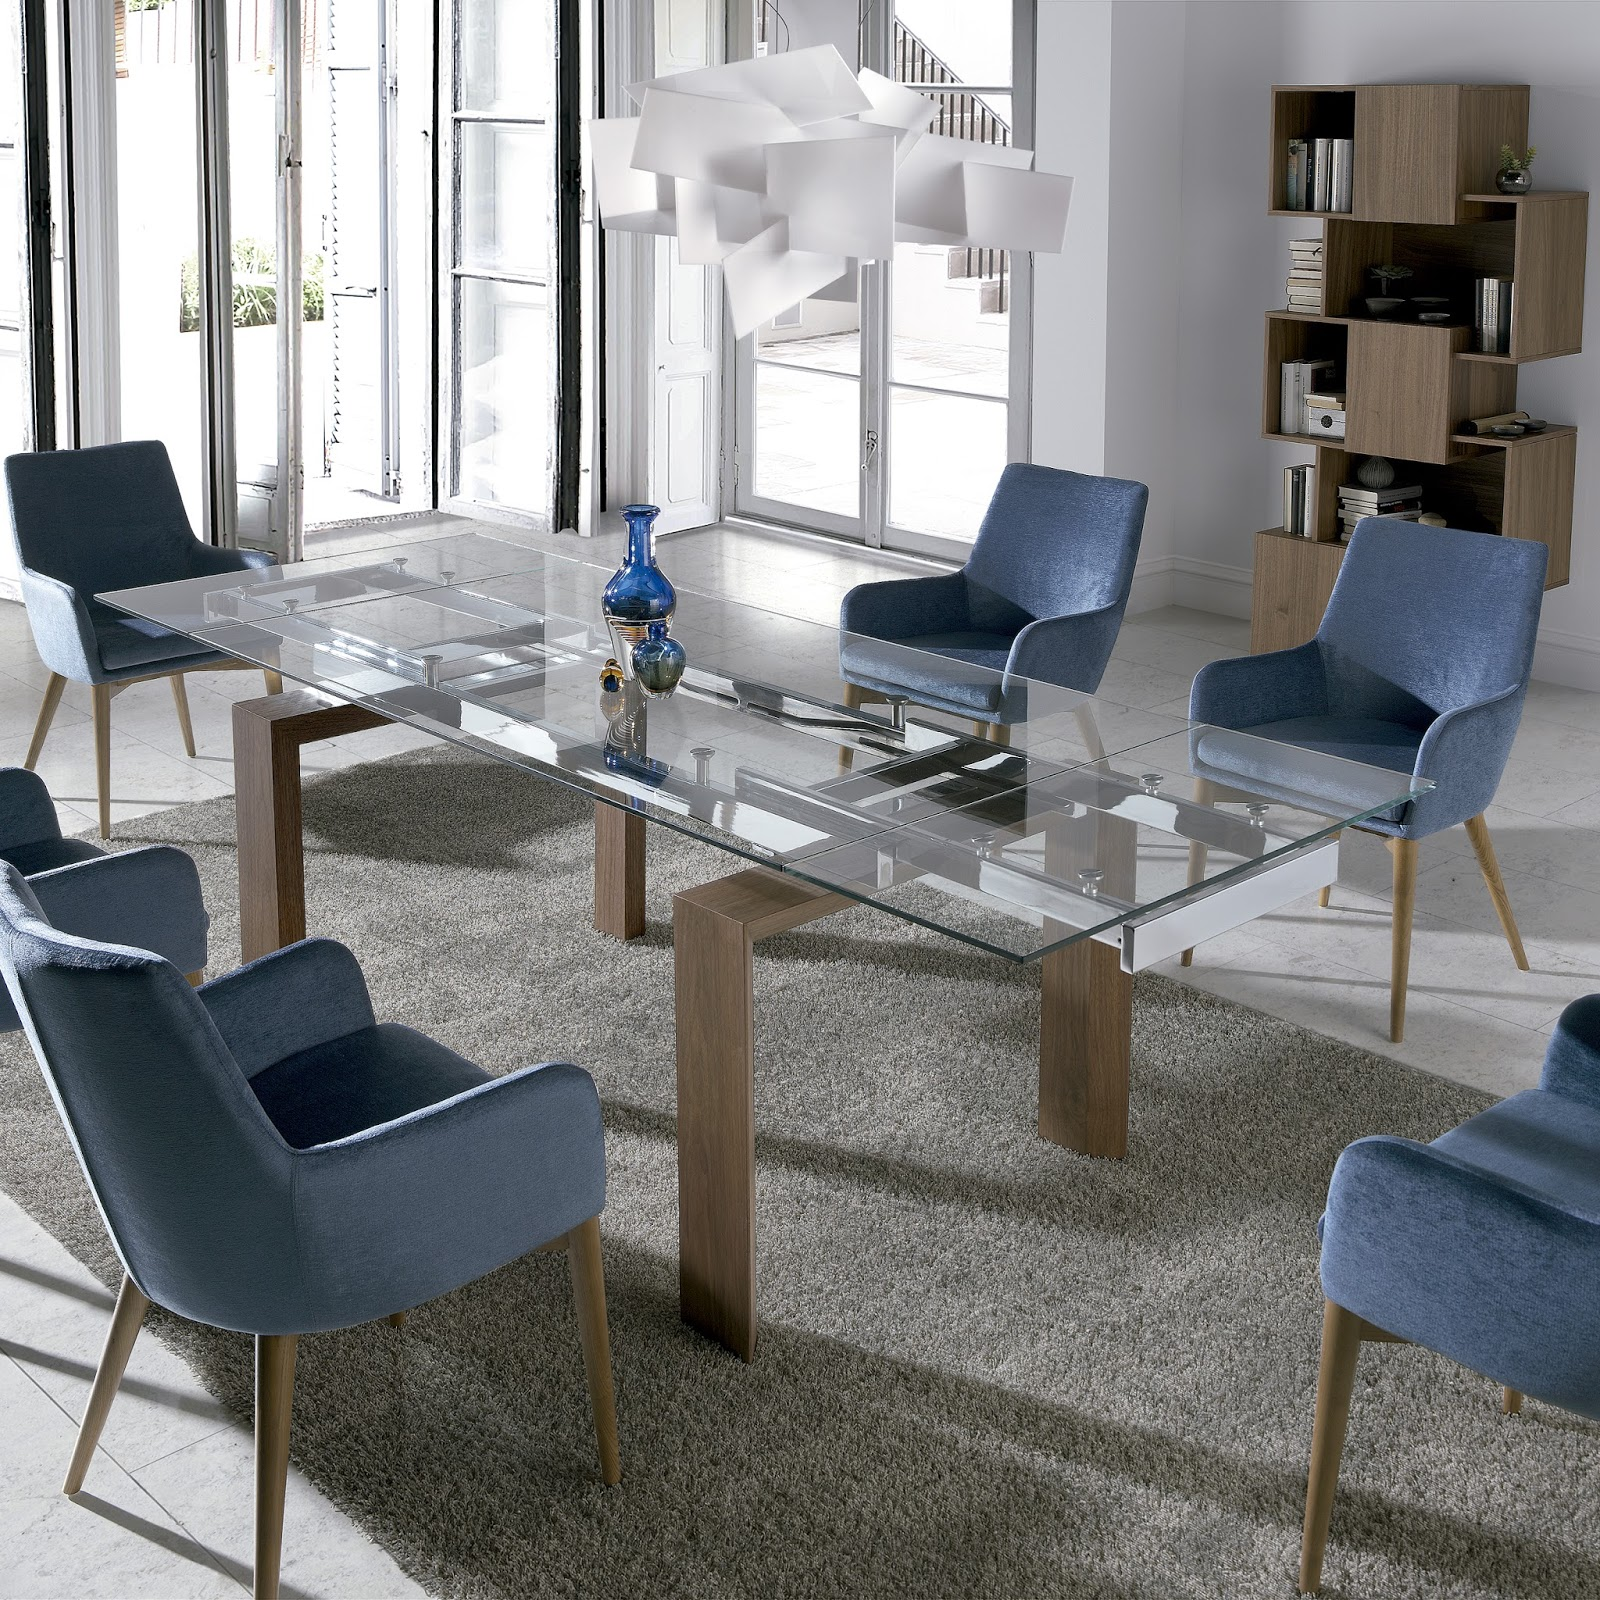 Mesas de comedor mesas de comedor extensibles de cristal - Mesa de comedor cristal ...